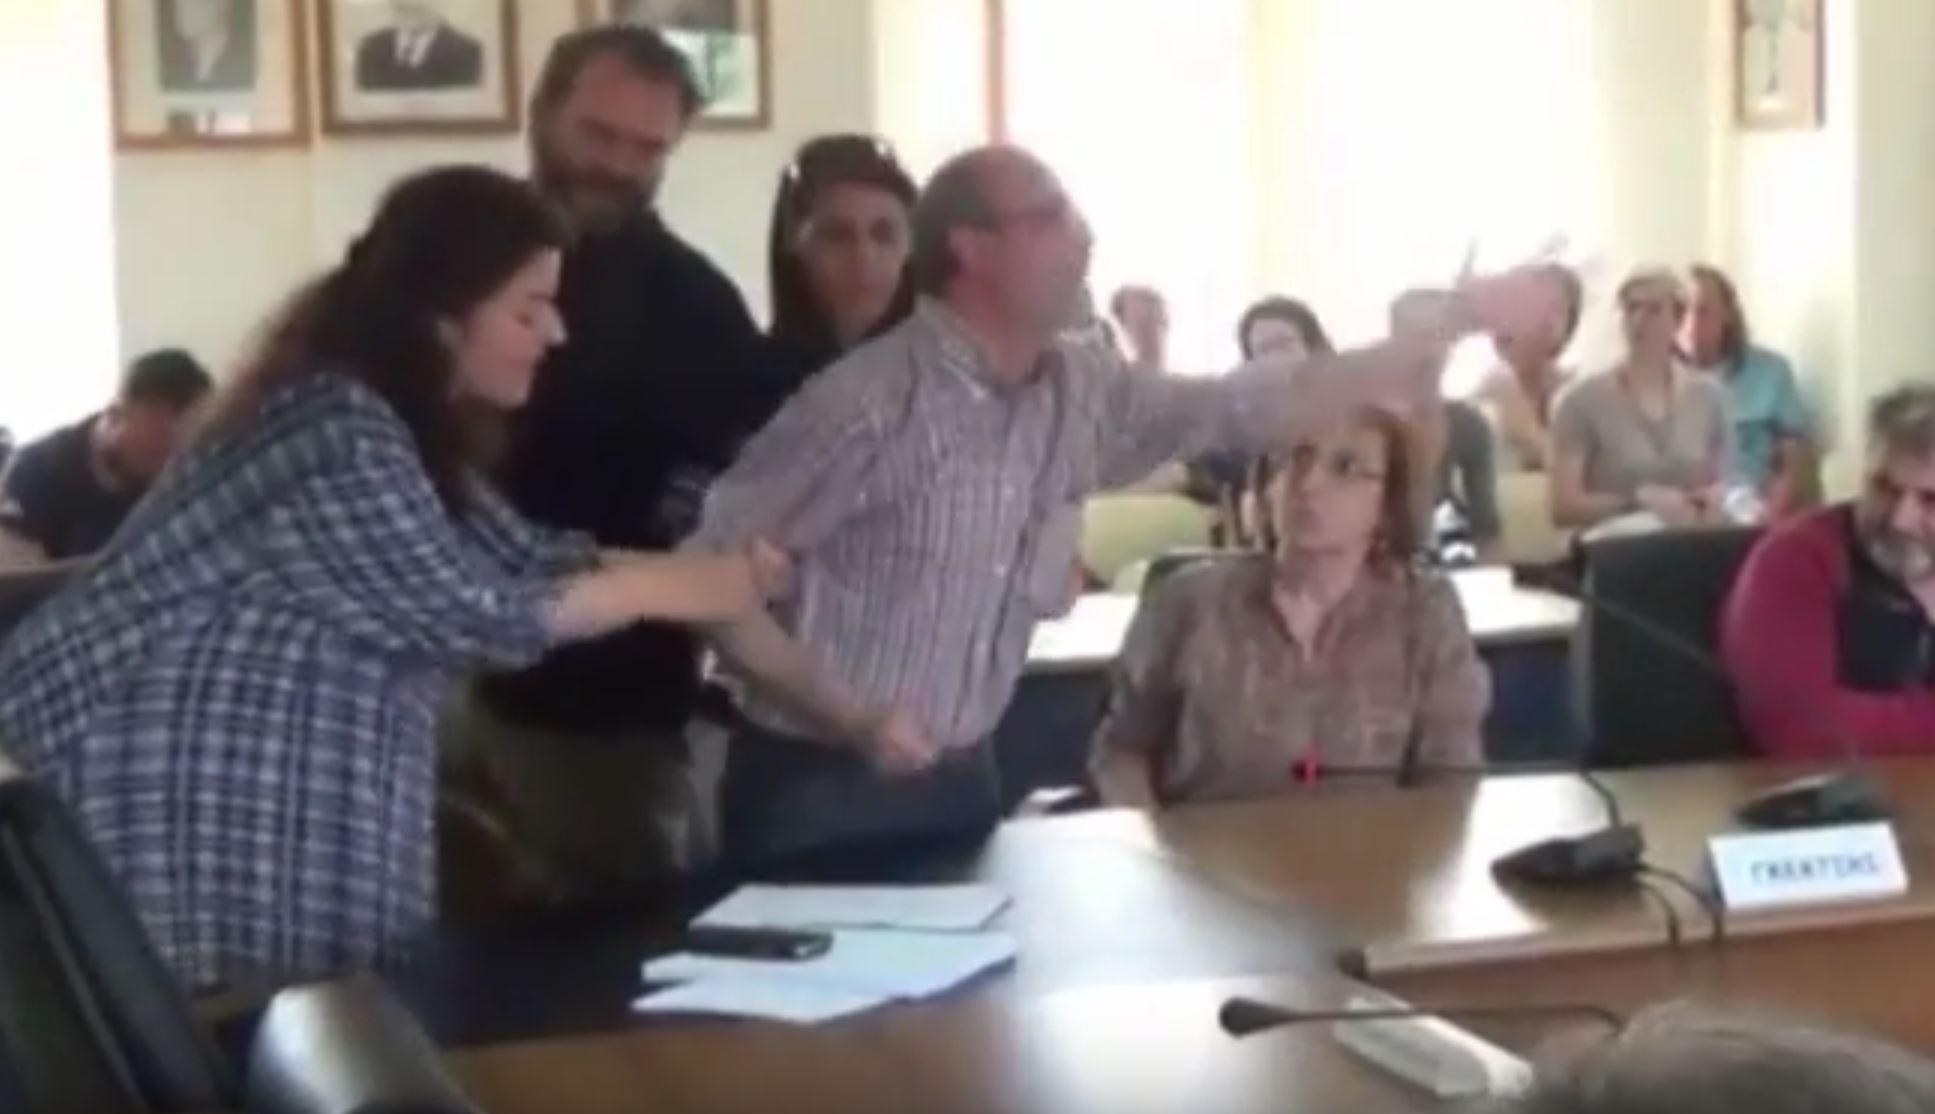 kozan.gr: Χαμός στο δημοτικό συμβούλιο Φλώρινας: Δημοτικός Σύμβουλος της Λαϊκής Συσπείρωσης, εκνευρίστηκε, όταν ο πρόεδρος αρνήθηκε να του δώσει το λόγο και πέταξε το μικρόφωνο και το μπουκάλι με το νερό που υπήρχαν μπροστά του – Προσπάθησαν να τον ηρεμήσουν – συγκρατήσουν σύντροφοι του (Bίντεο)